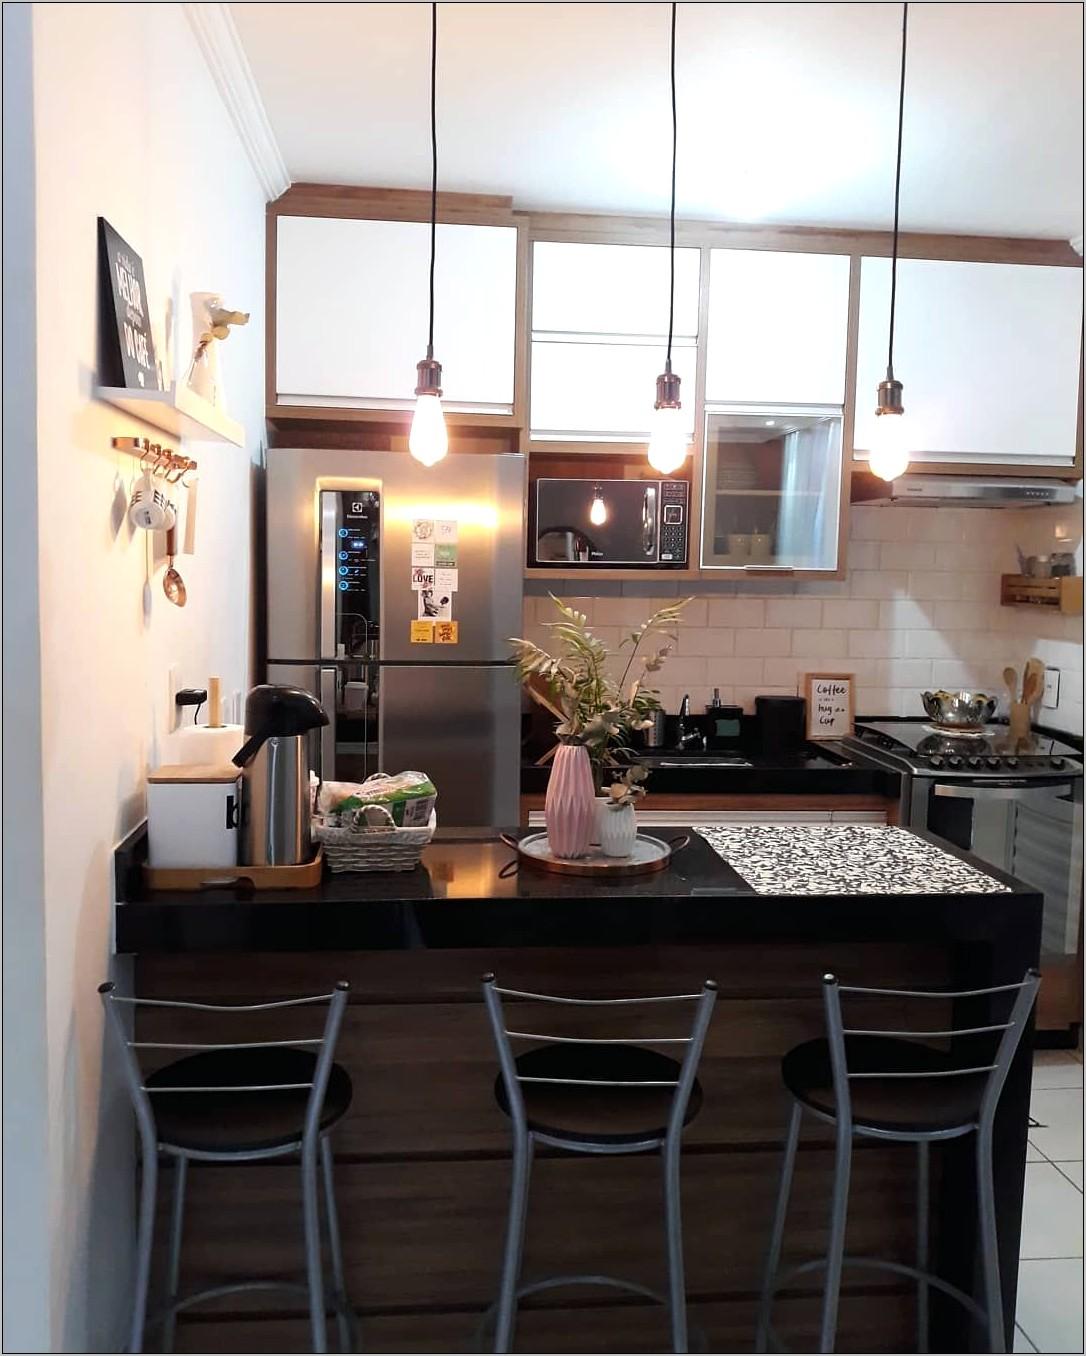 Kitchen Conter Decor Ideas